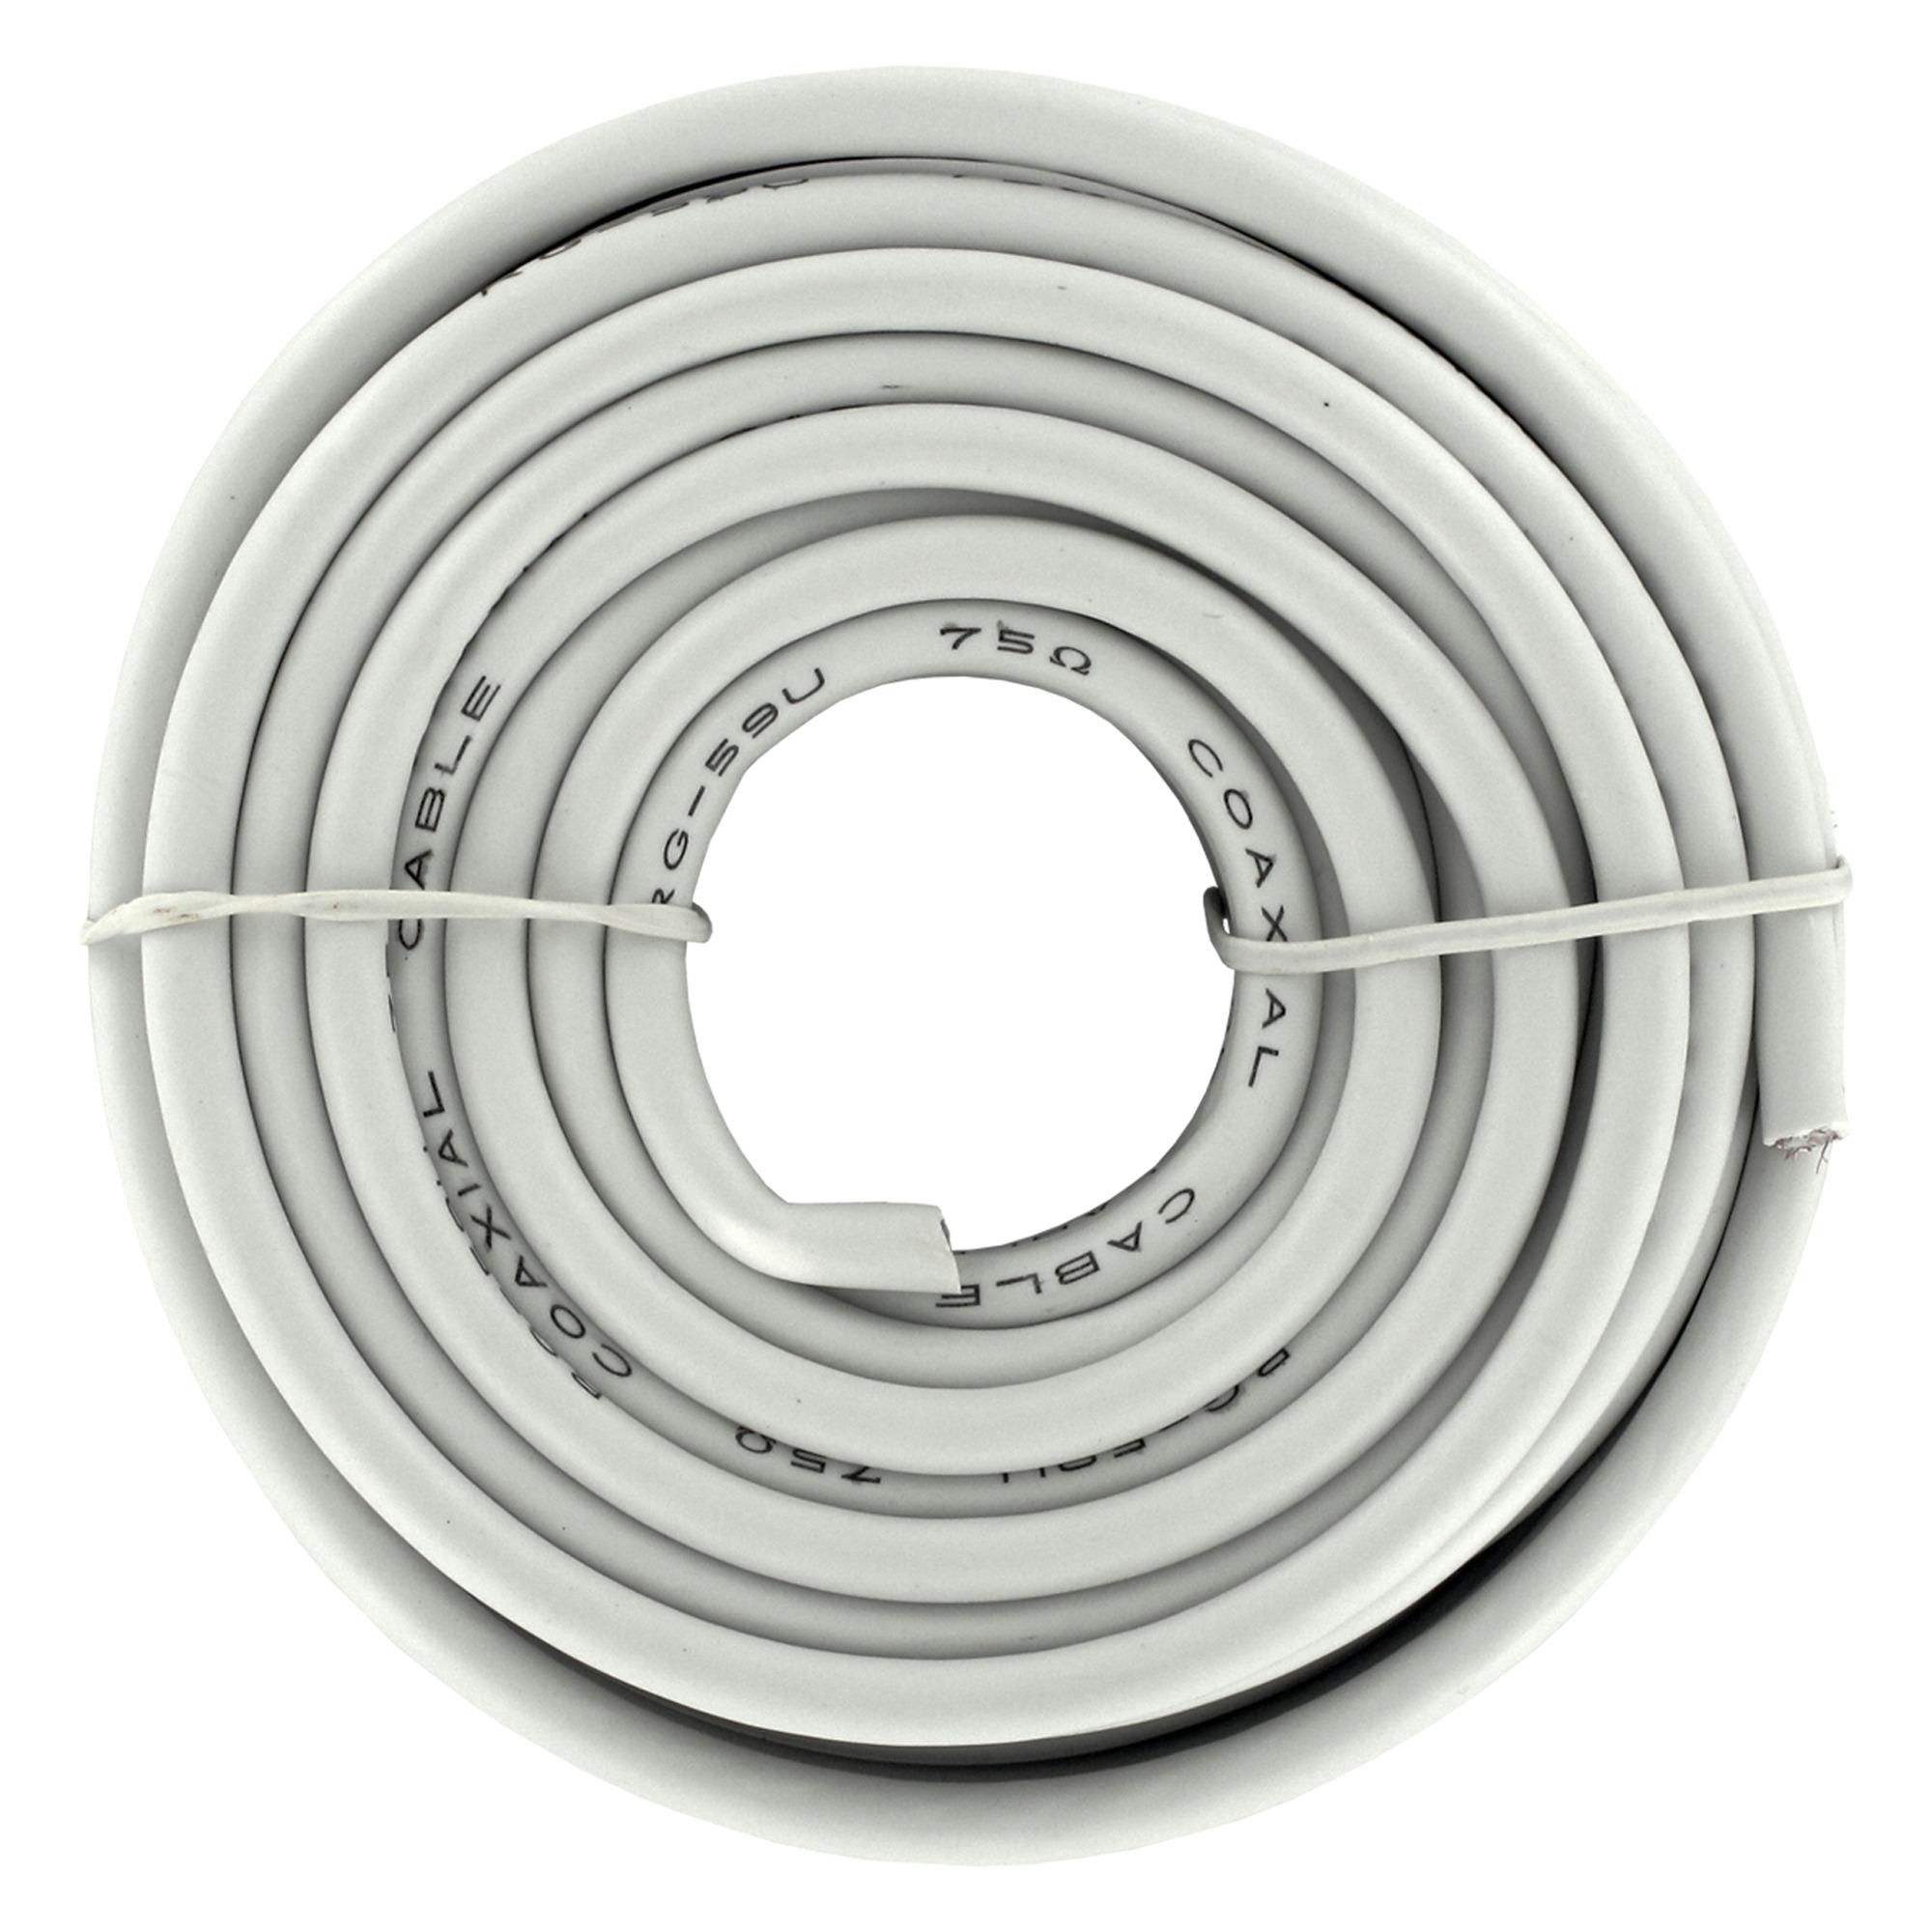 Q-Link coax kabel RG6 10 meter wit